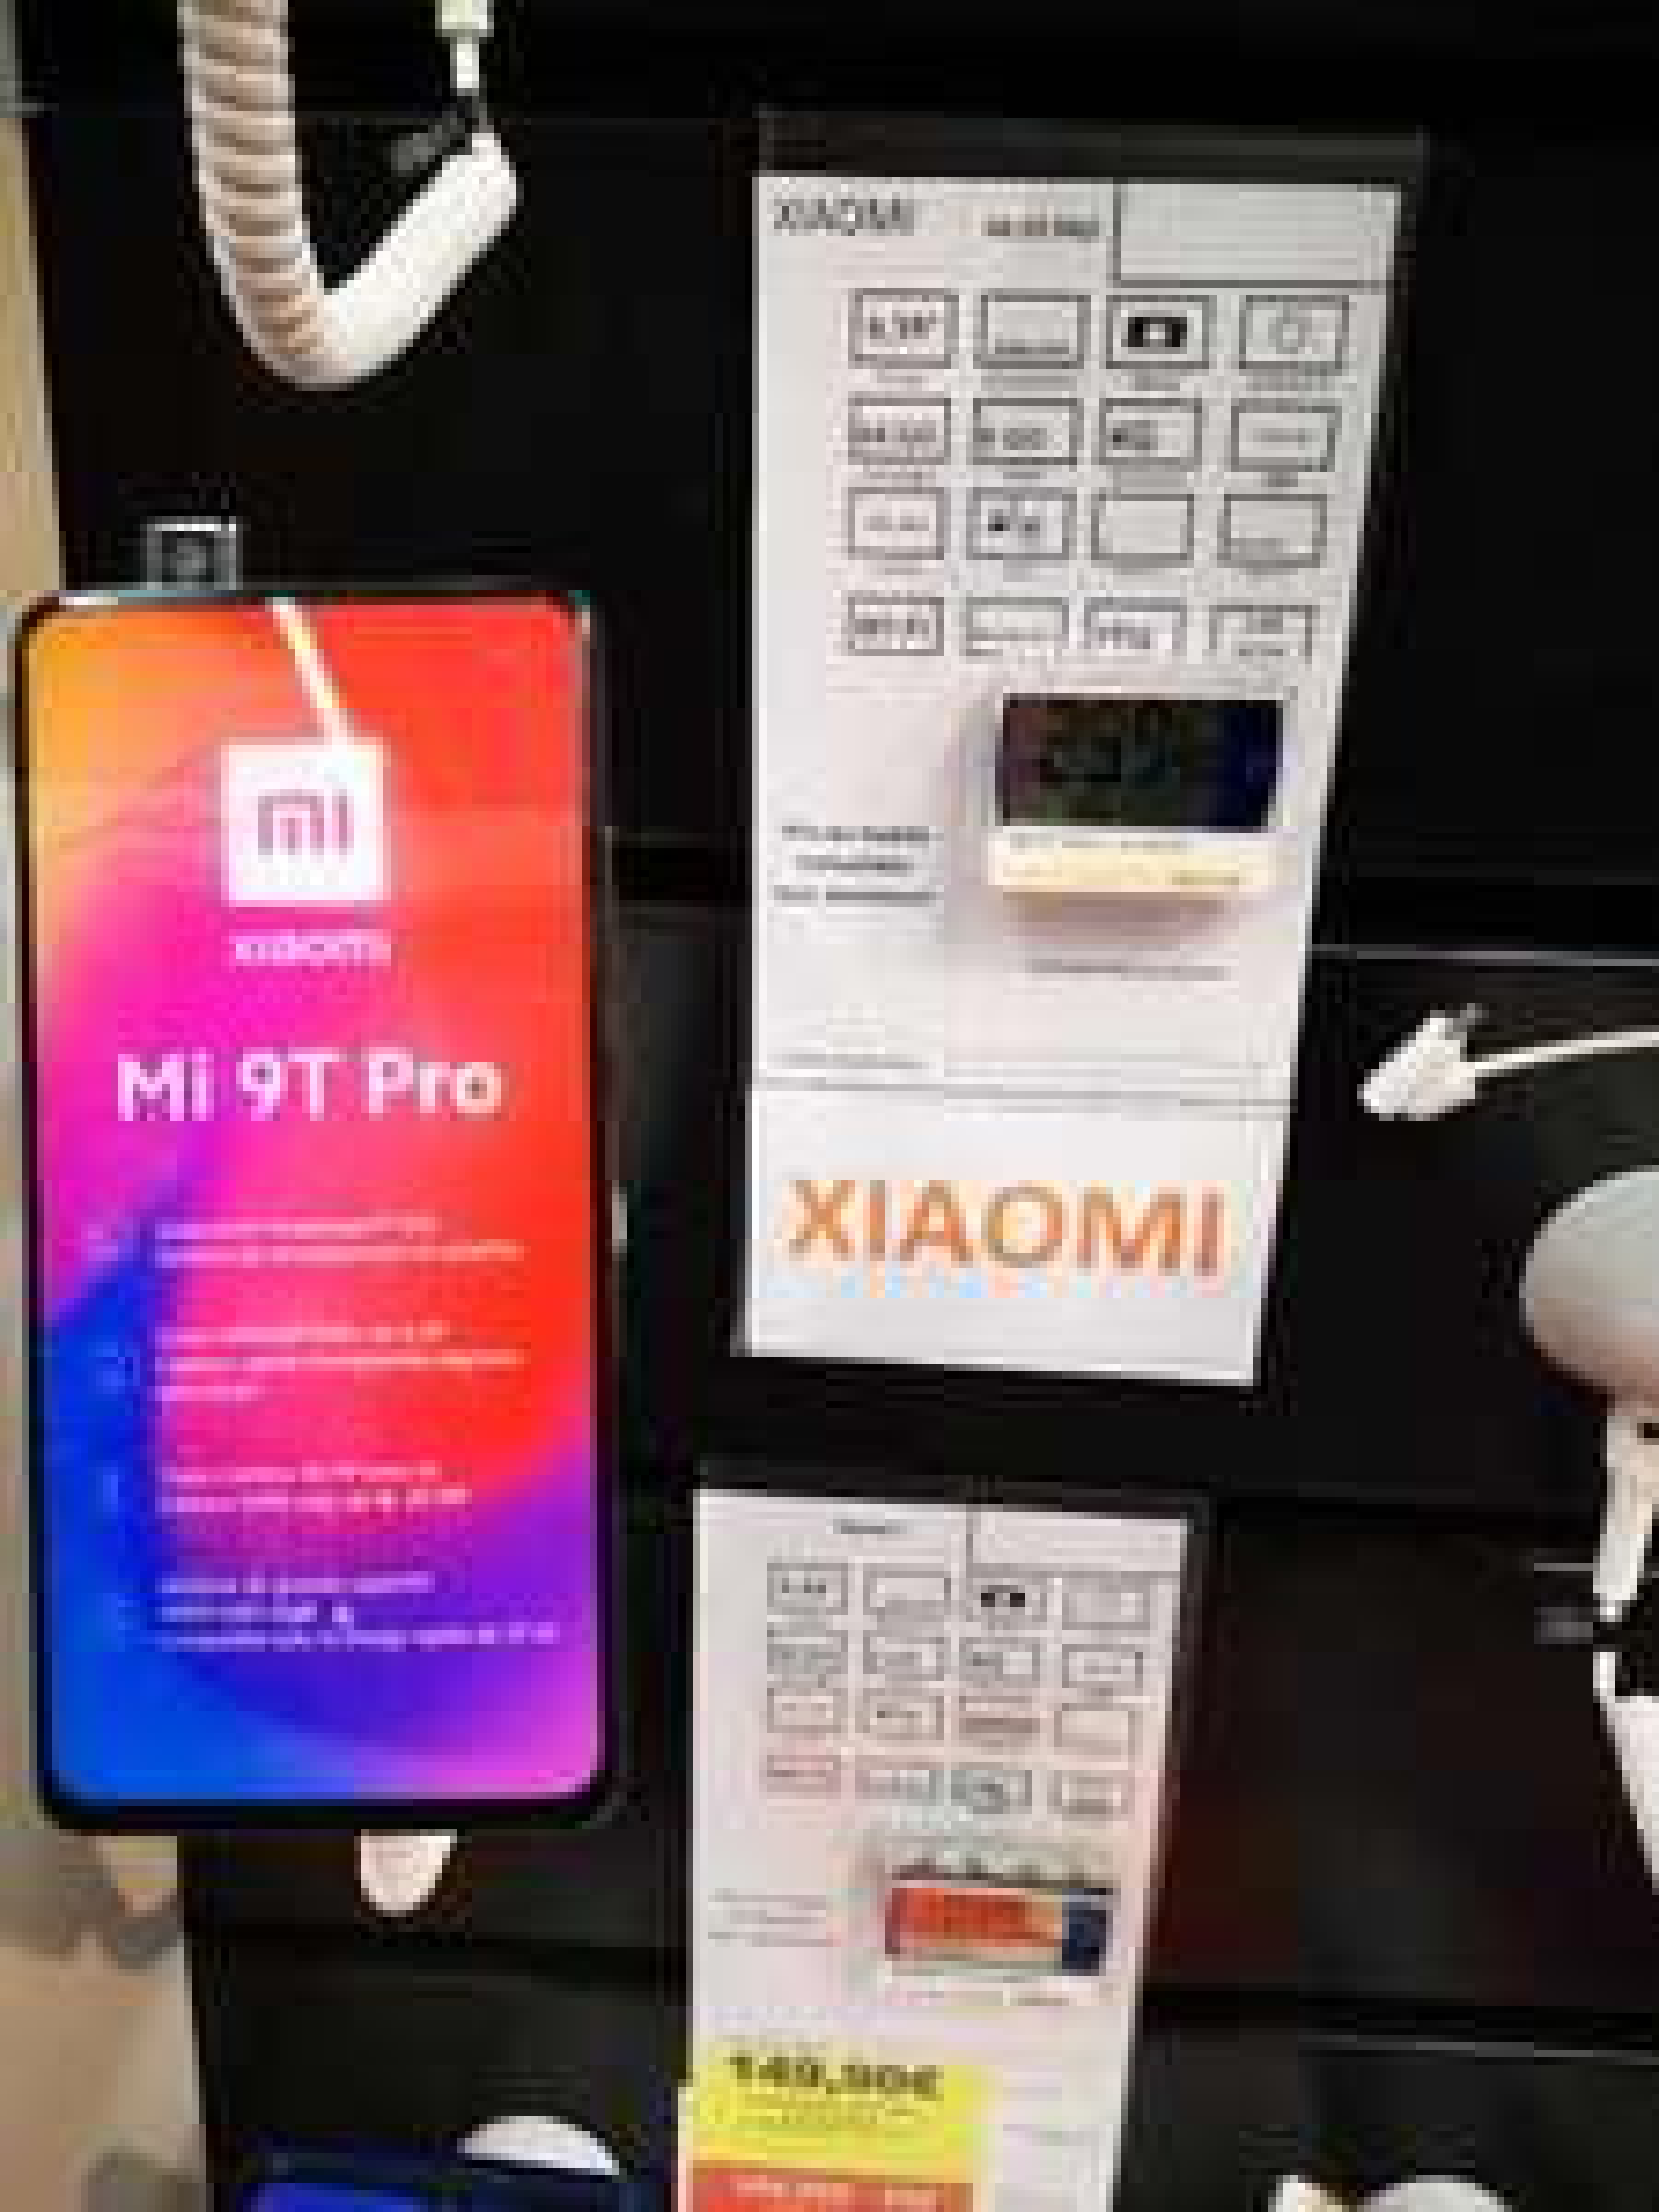 "Smartphone 6.39"" Xiaomi Mi 9T Pro - full HD+, SnapDragon 855, 6 Go de RAM, 64 Go (Labège 31)"